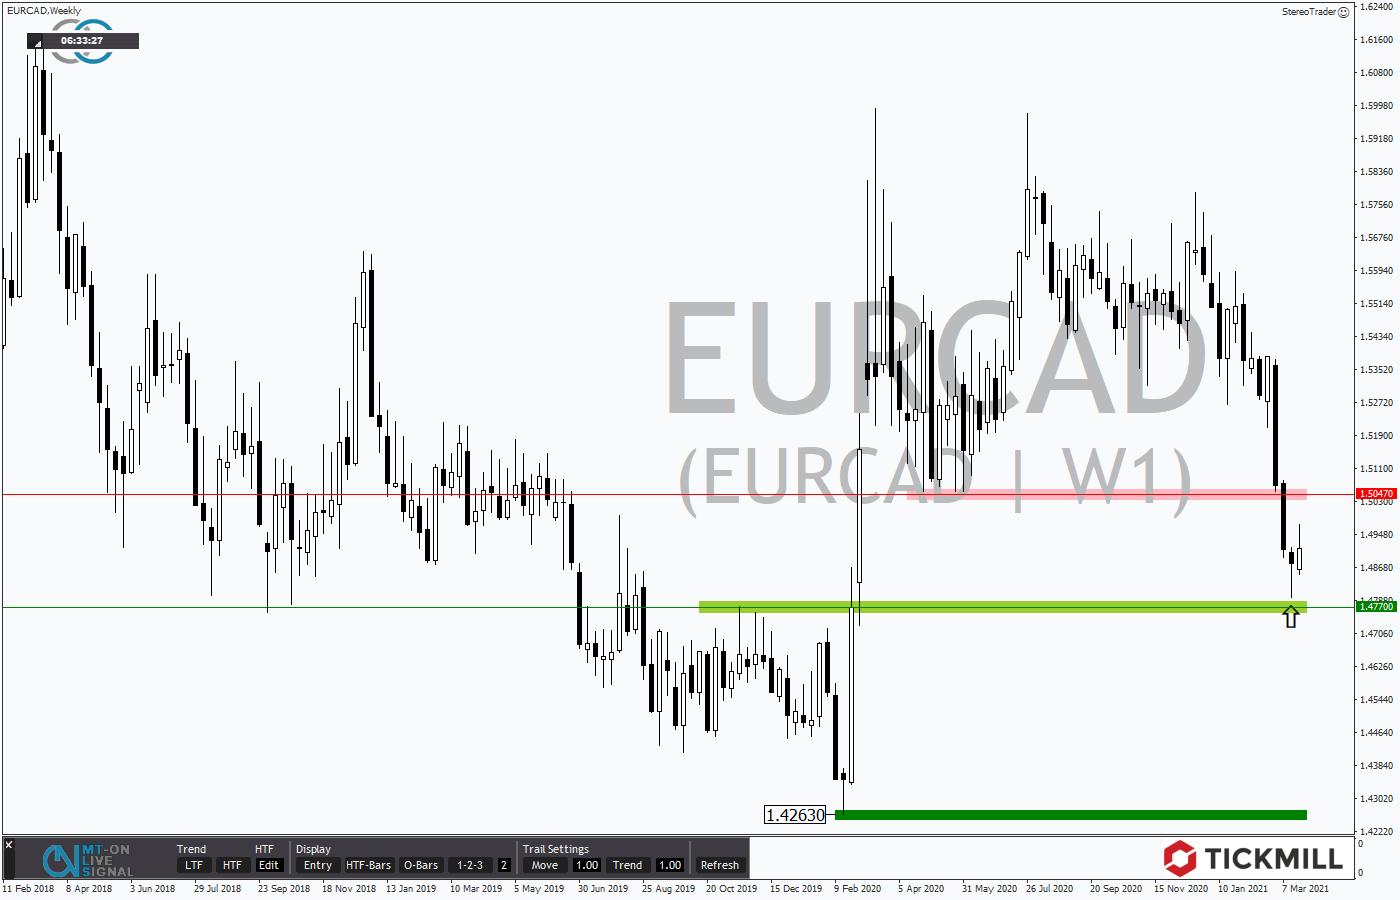 Tickmill-Analyse: Wochenchart im EURCAD